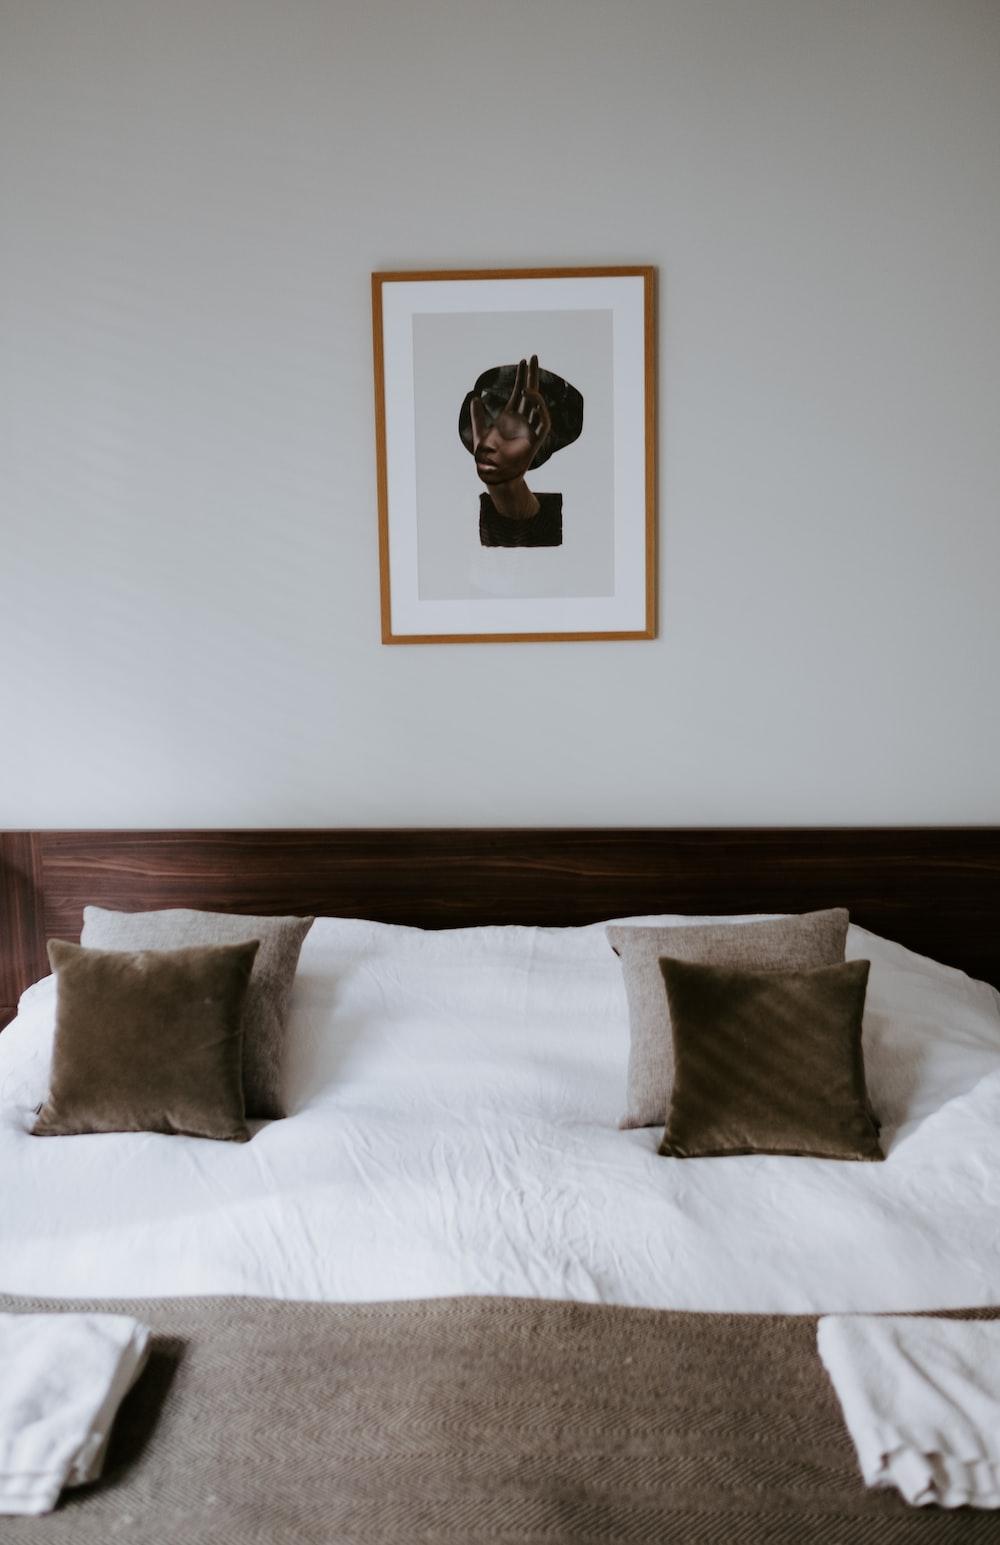 white and brown bedspread set inside bedroom